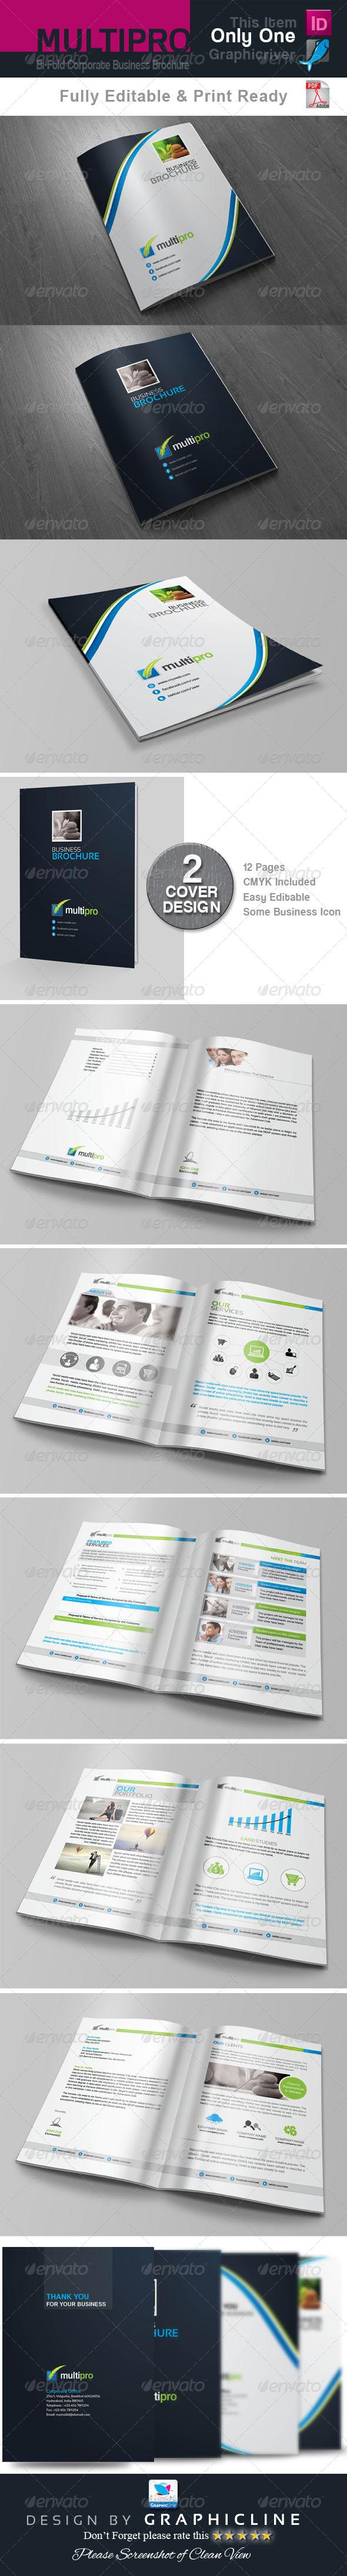 GraphicRiver Multi Pro Bi Fold Corporate Business Brochure 7141659